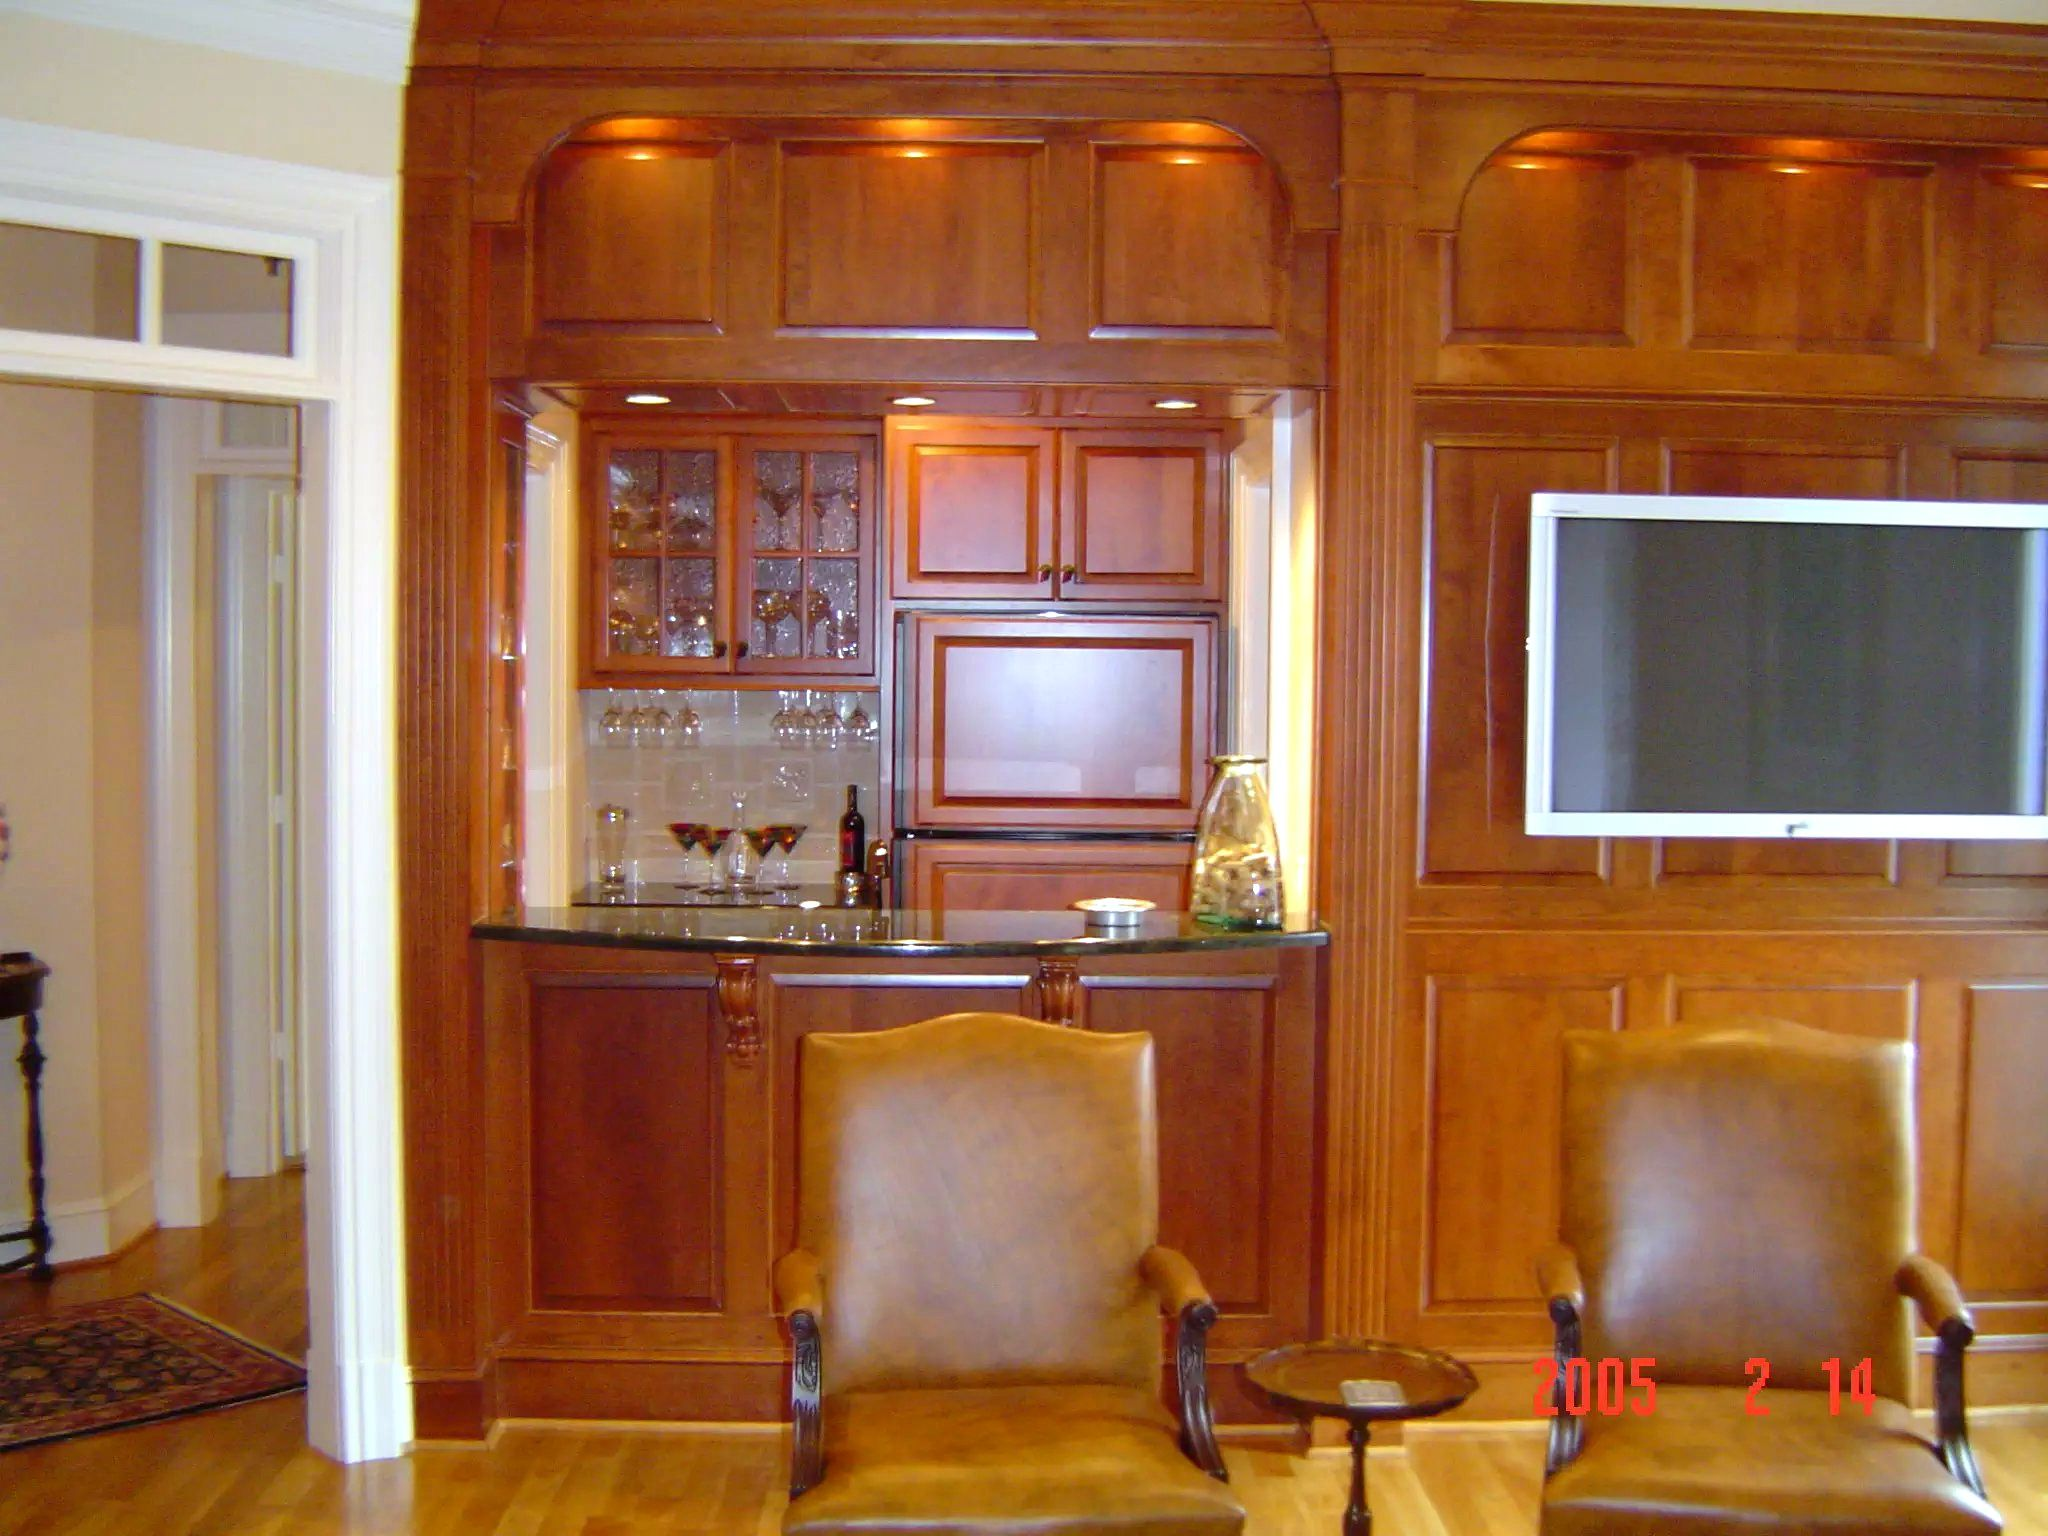 Dorable Muebles De Cocina Manchados Ideas Ornamento Elaboración ...